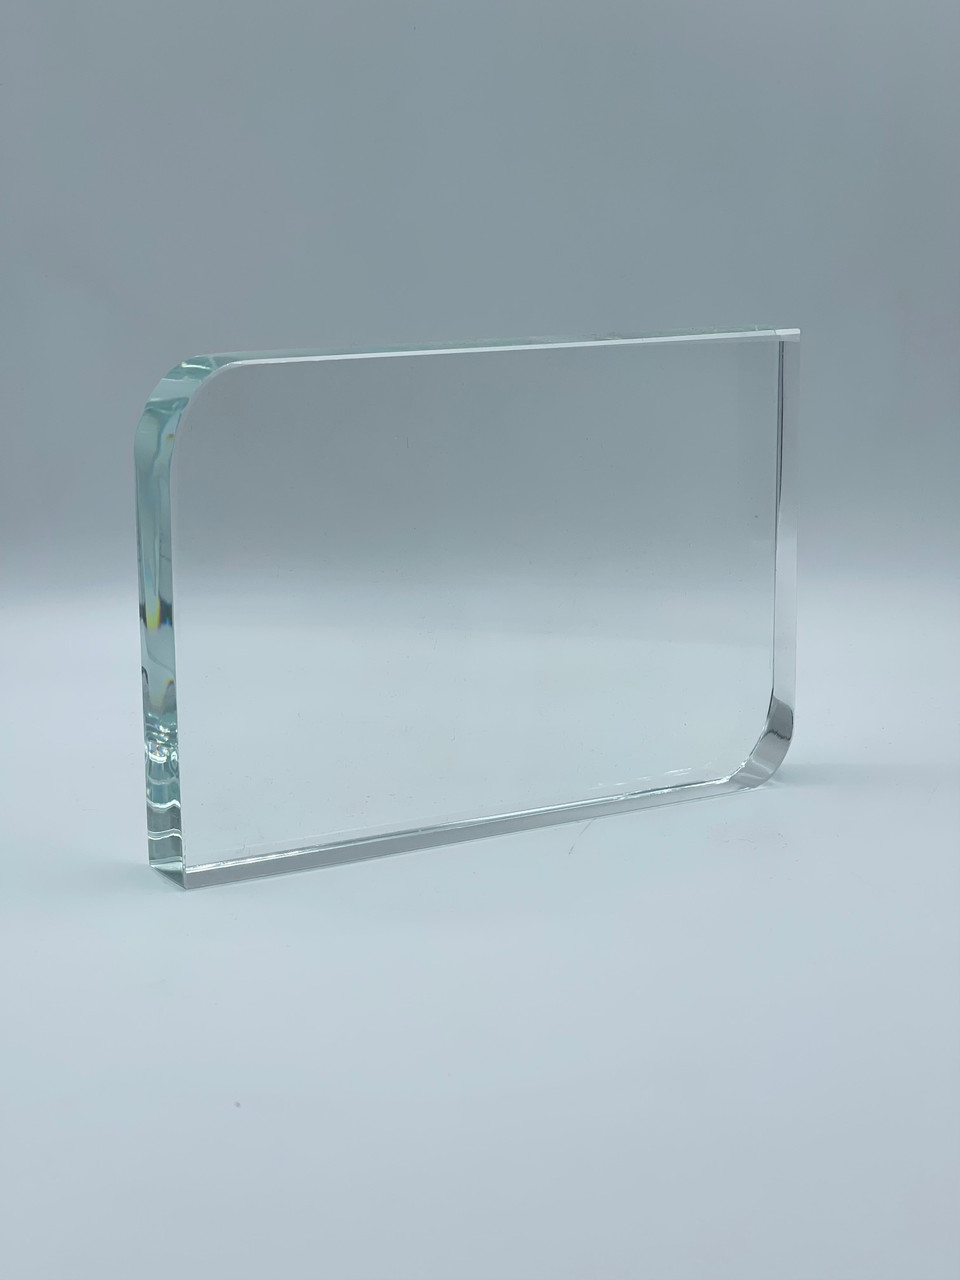 Награда из стекла, размер - 100х150мм